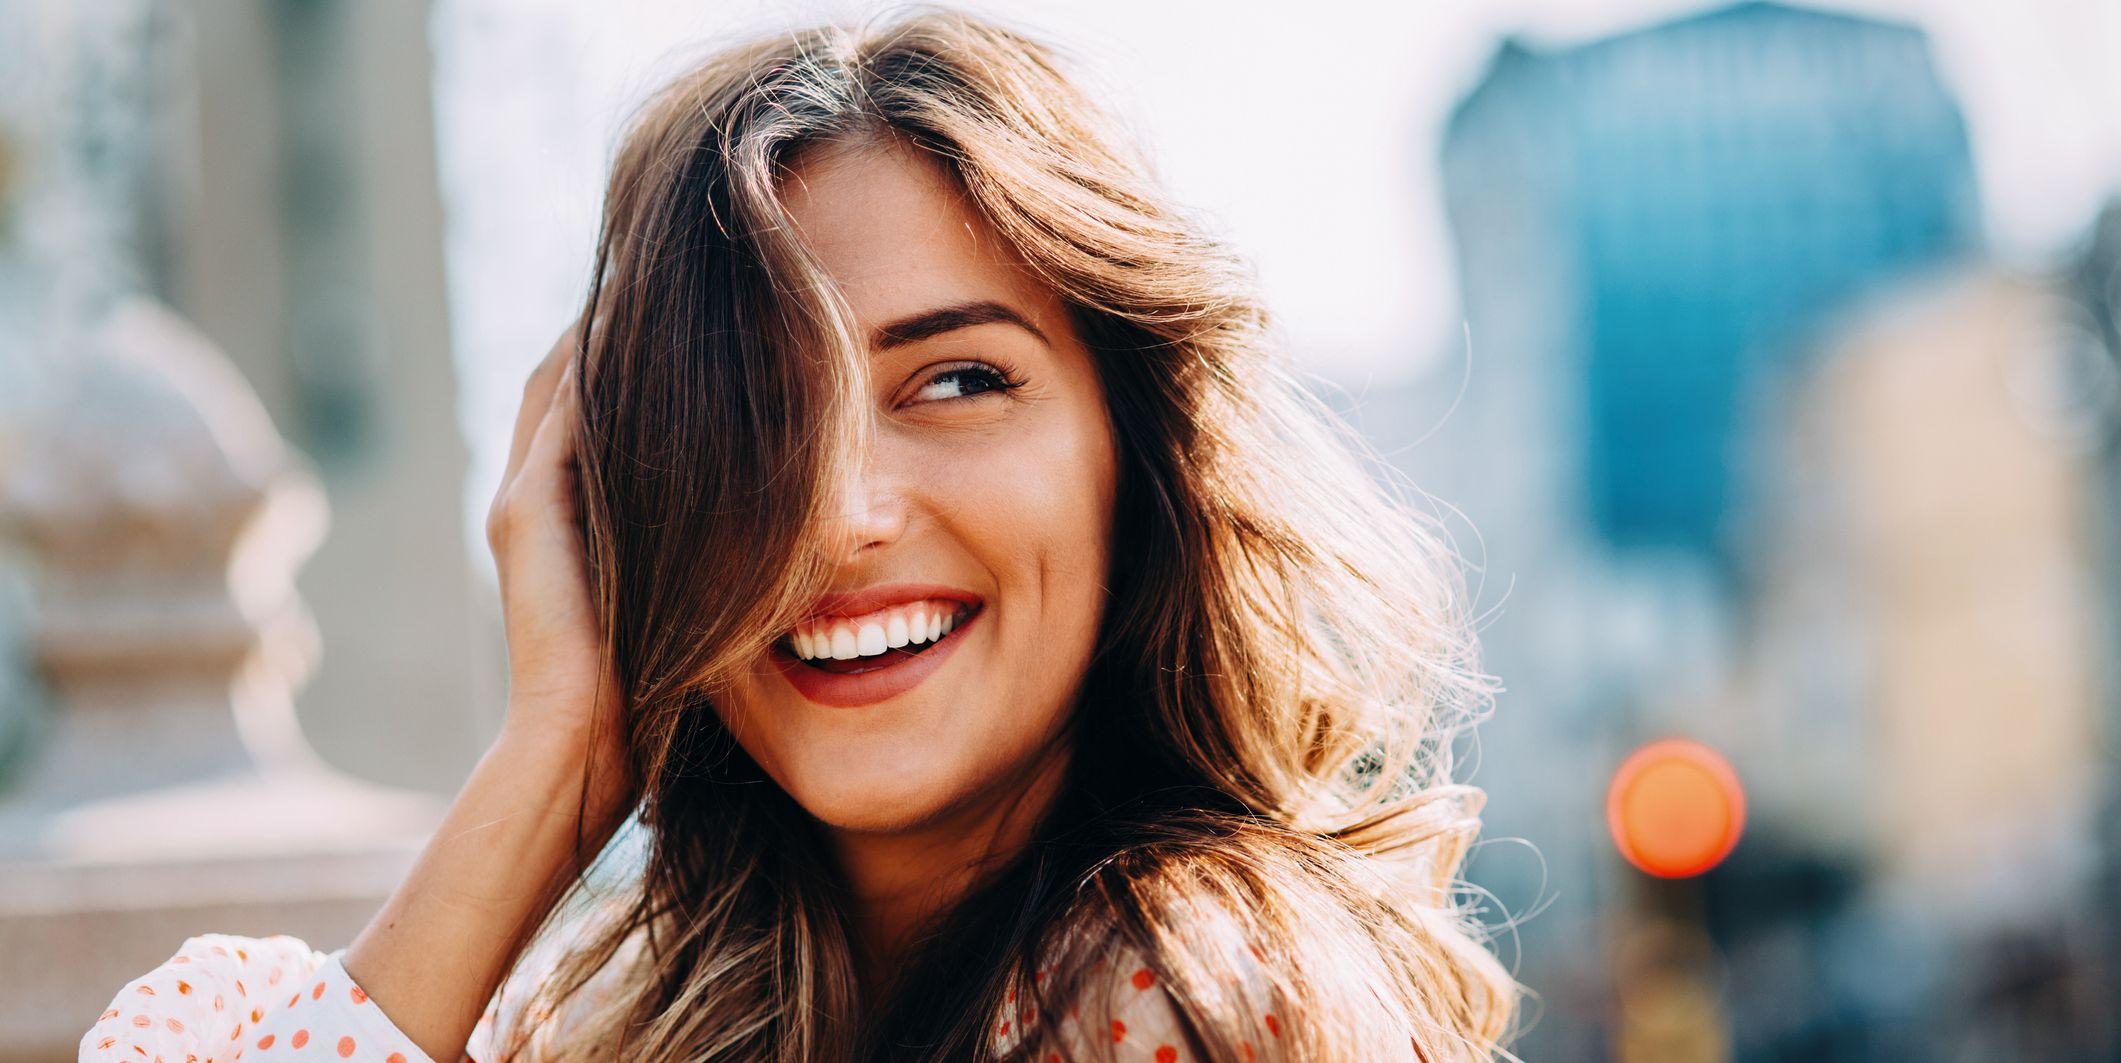 Best shampoo for greasy hair - Women's Health UK